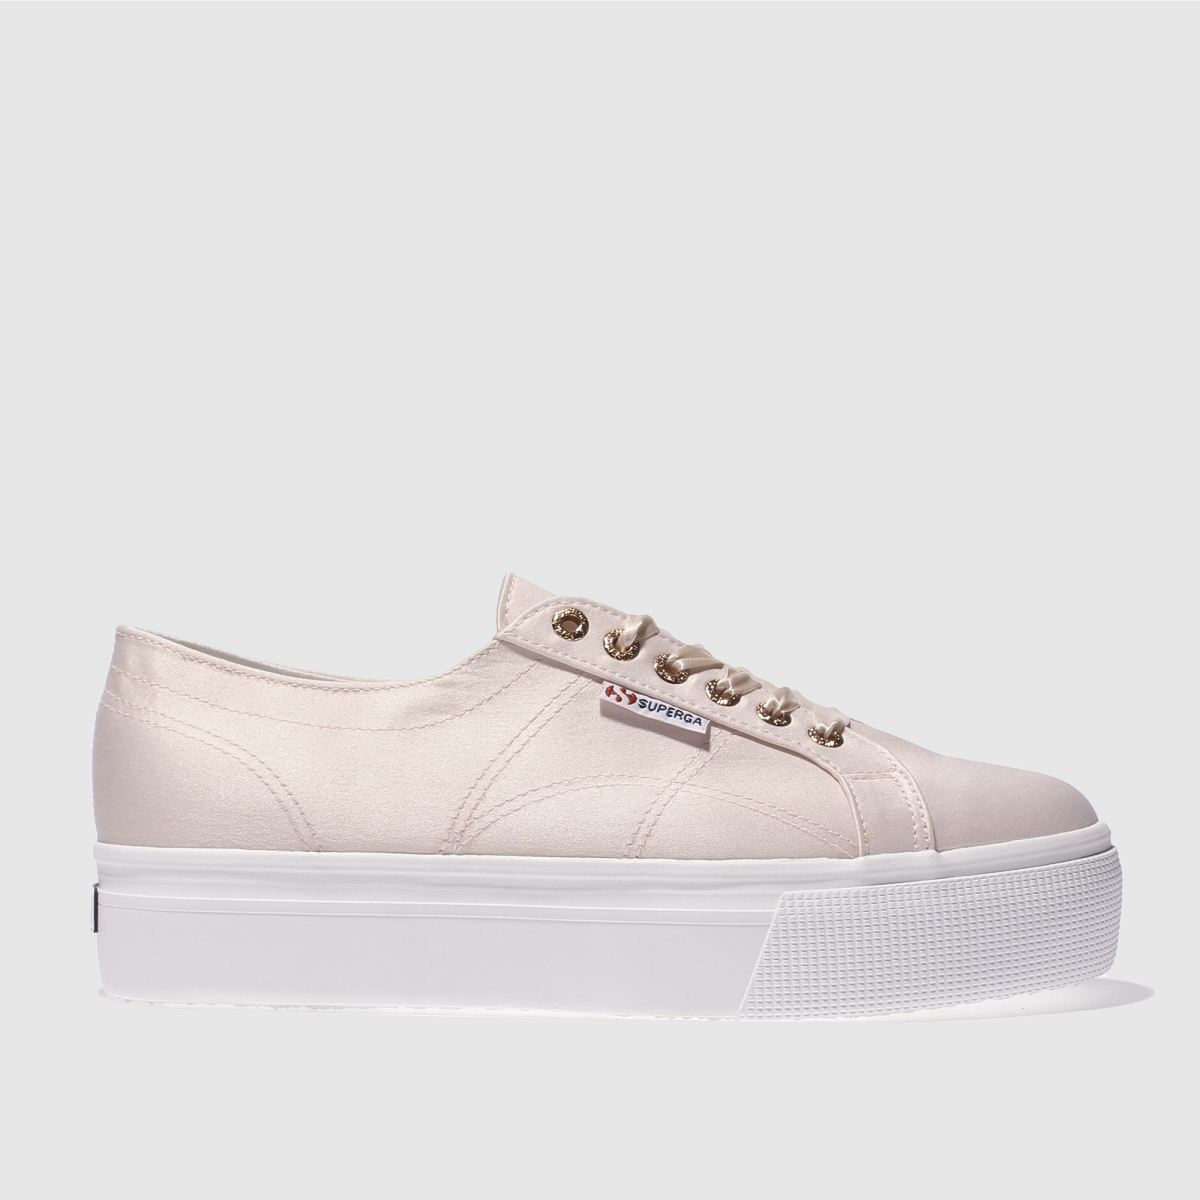 superga pale pink 2790 flatform satin trainers